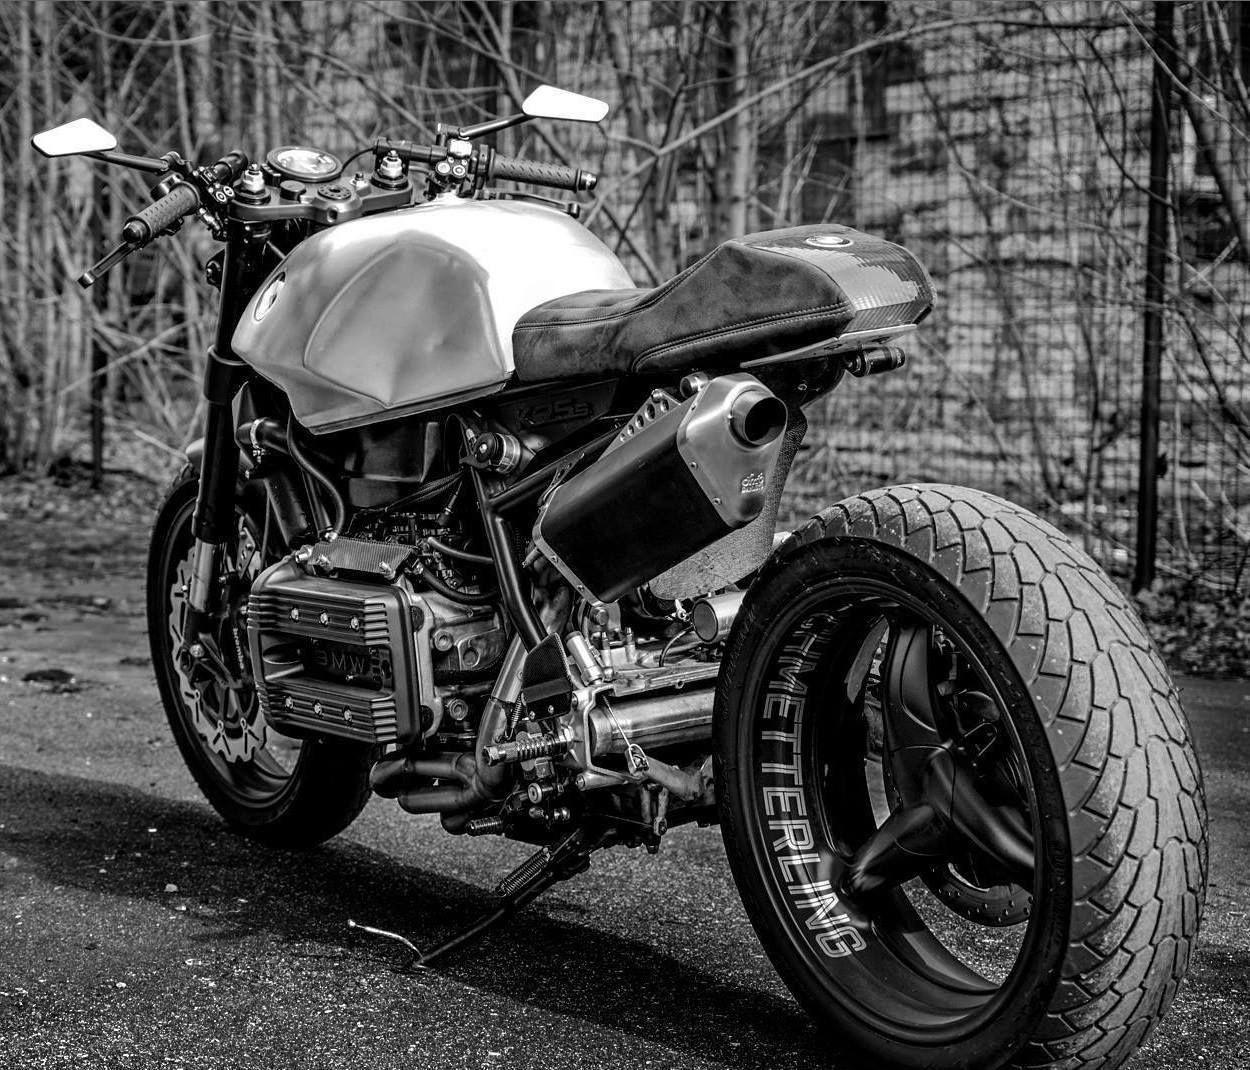 bmw k caf bmw custom motorcycles bmw motorbikes bmw. Black Bedroom Furniture Sets. Home Design Ideas